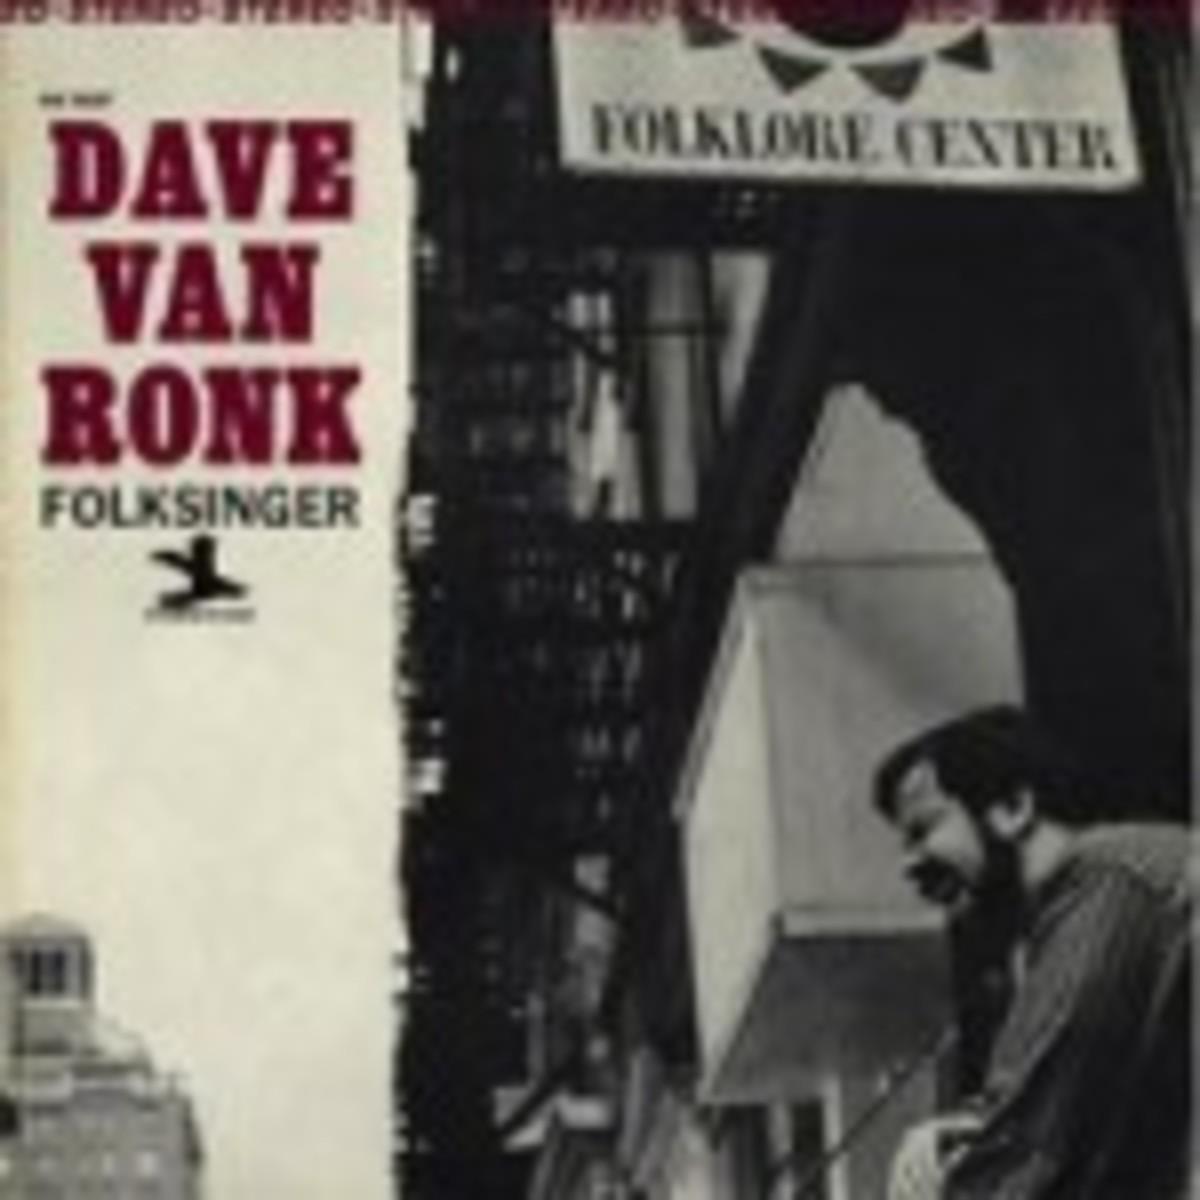 Dave Van Ronk Folksinger